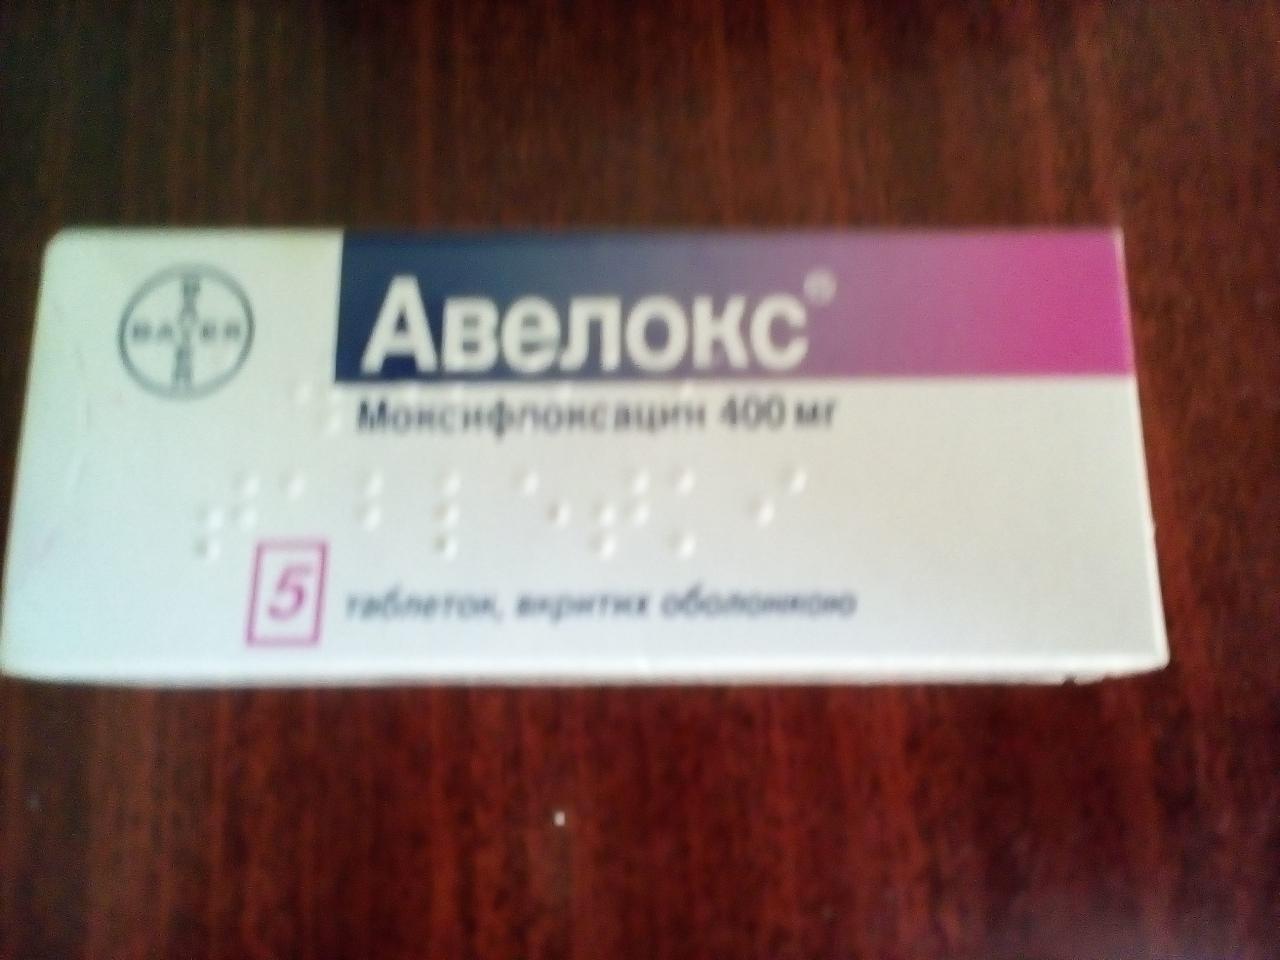 Ciprofloxacin 2 mg/ml Solution for Infusion - Summary of